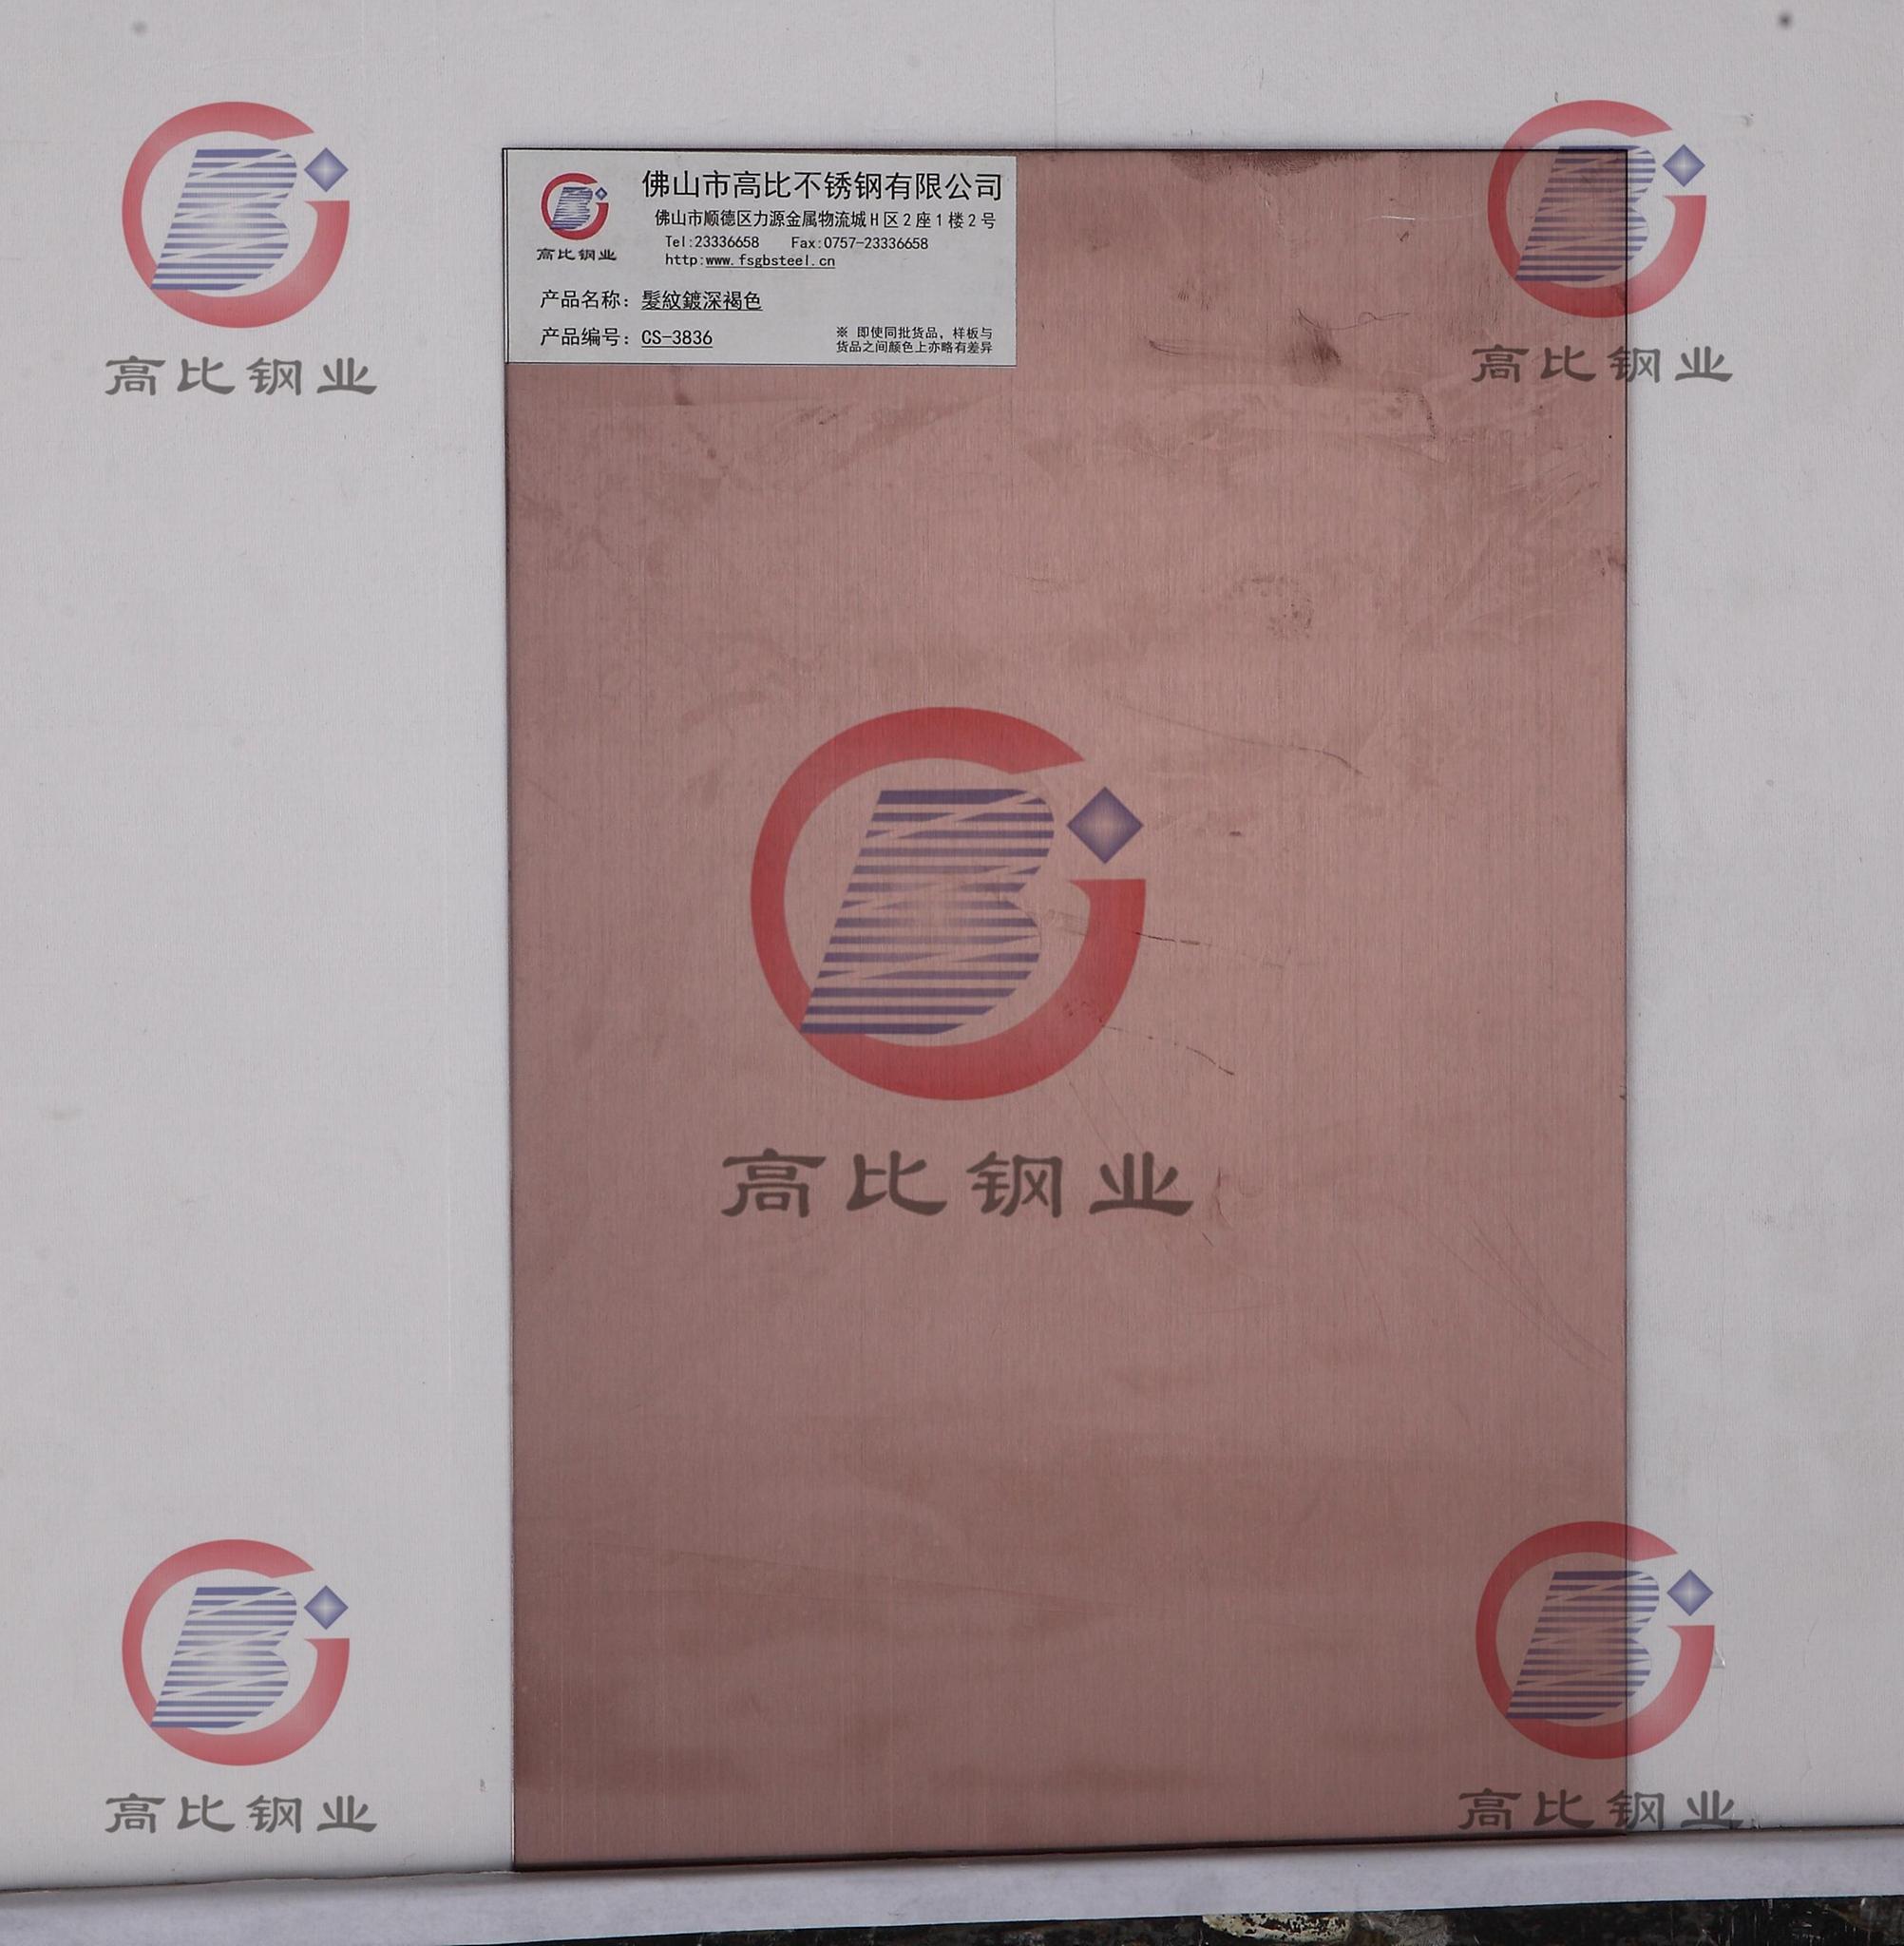 CS-3836 发纹镀深褐色 家居金属制品装饰材料